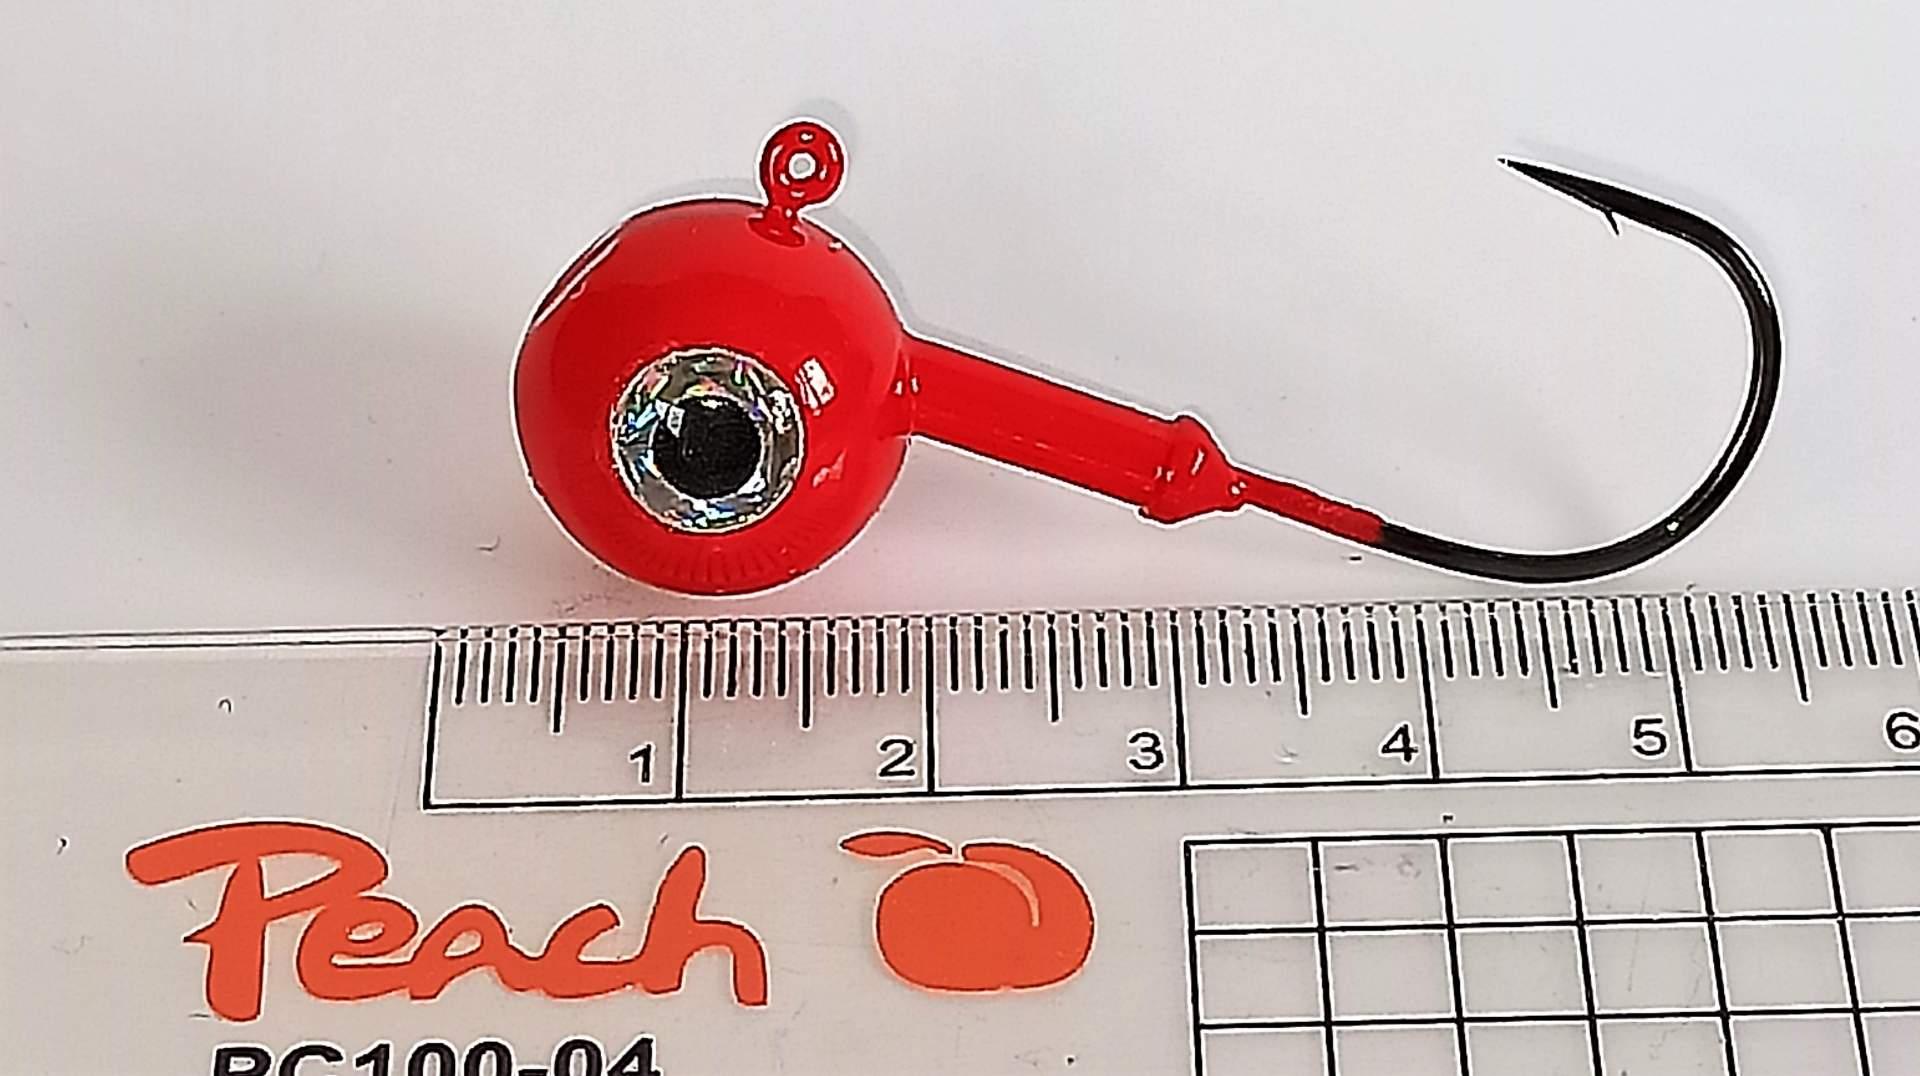 Vanfook jig 25g háček velikost 4/0 s nálitkem red plus oko